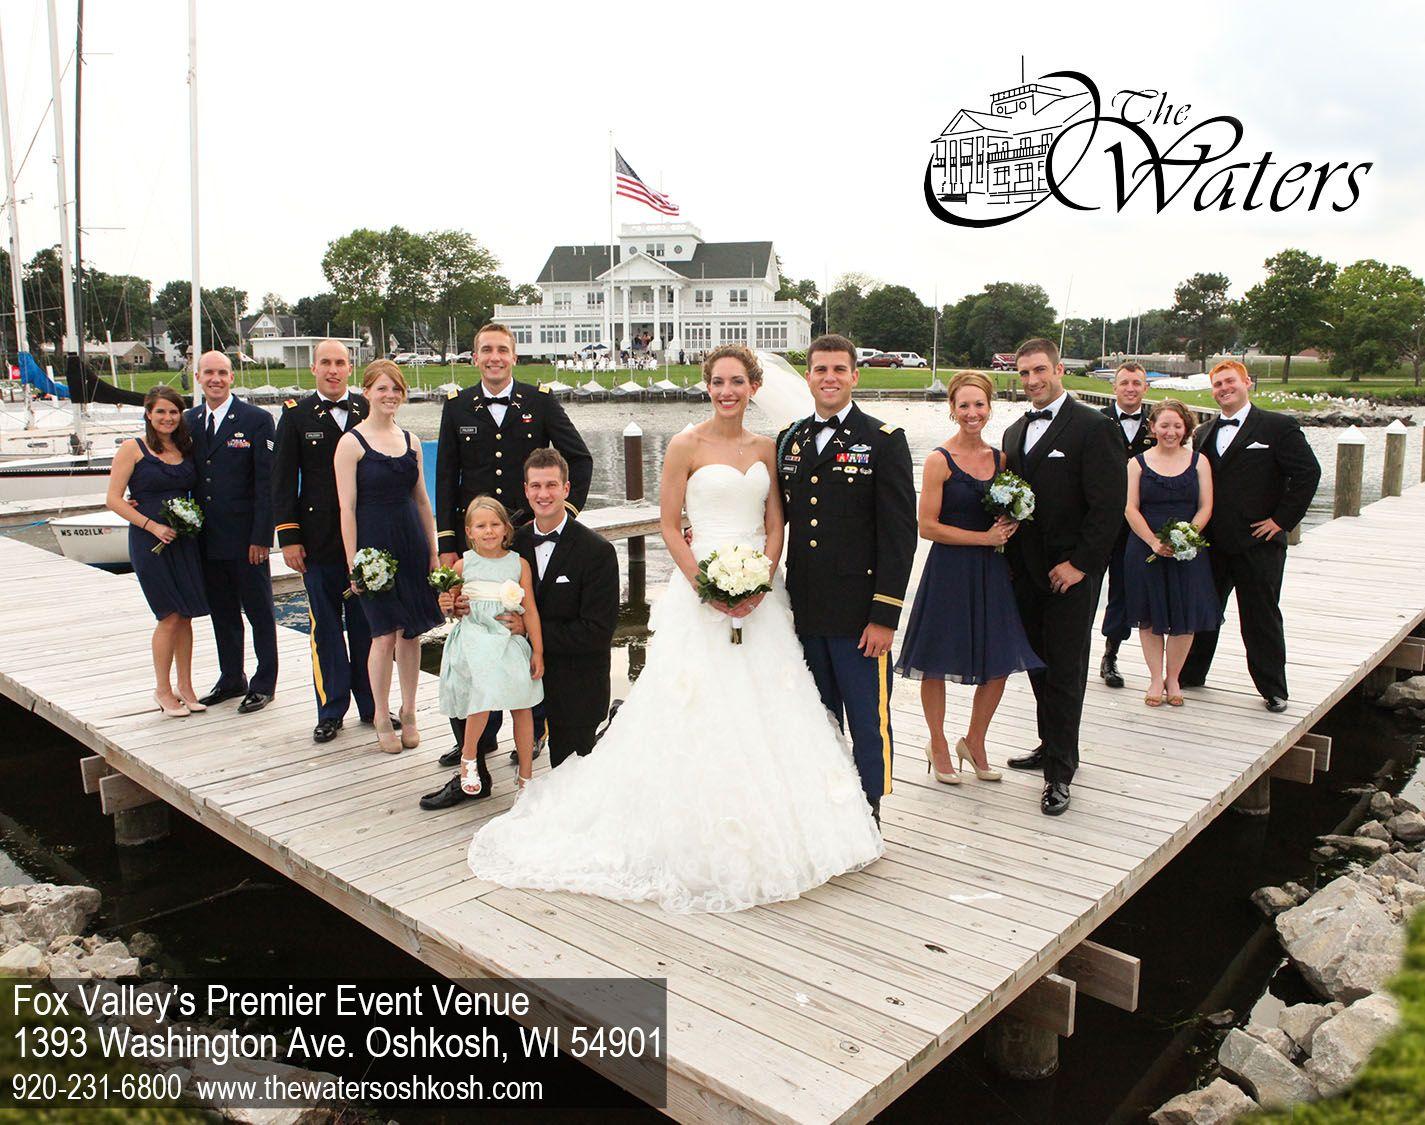 Wedding Ceremony Sites Chapels In Leton Fox Valley Green Bay And Sheboygan Wi